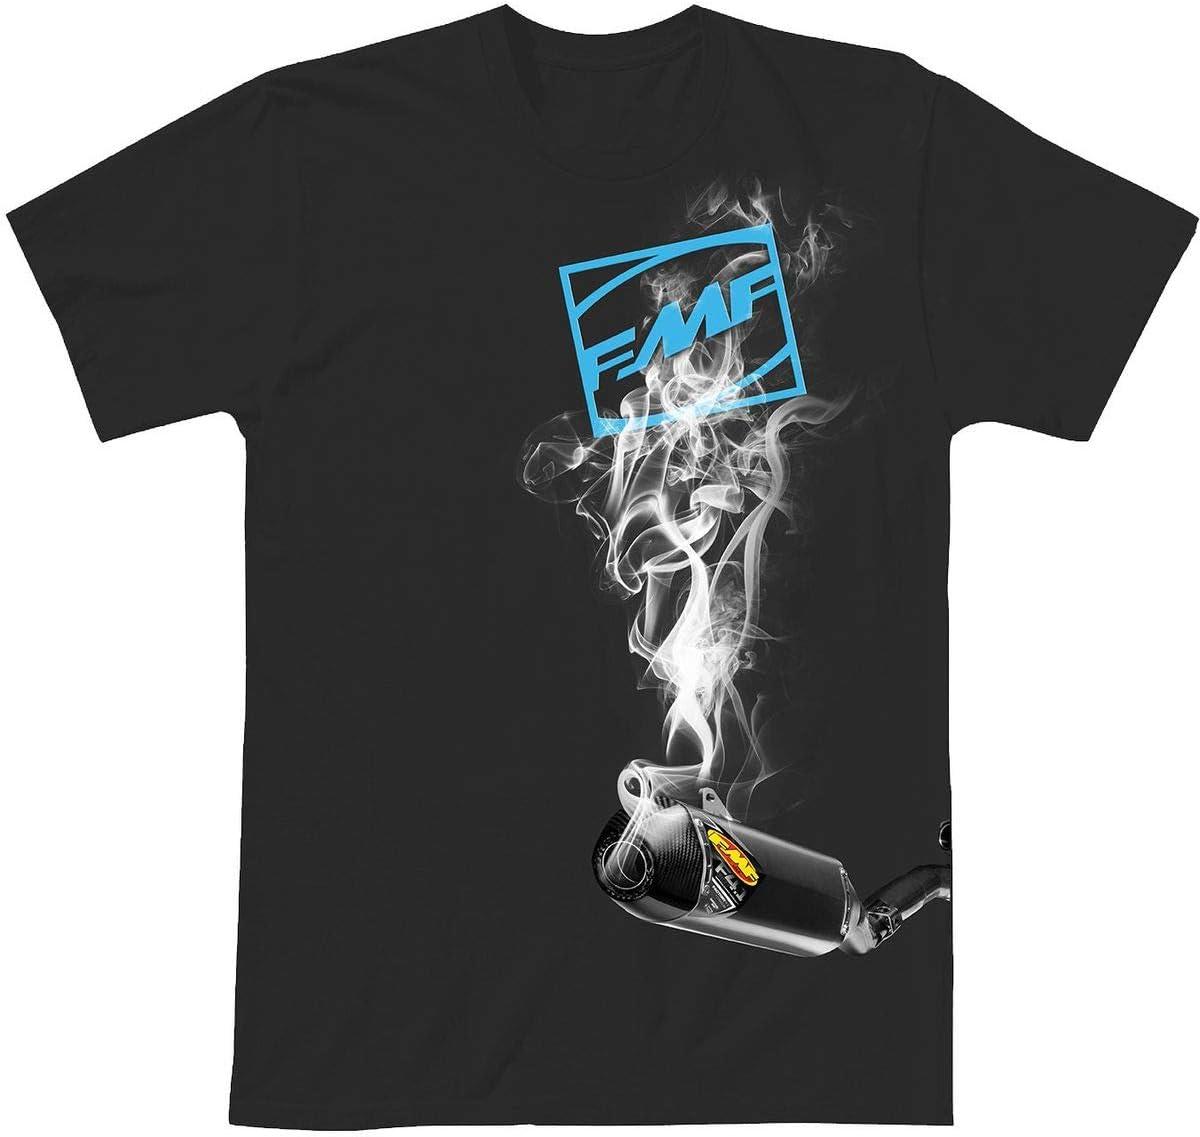 Black, Large FMF Racing Boxcage T-Shirt